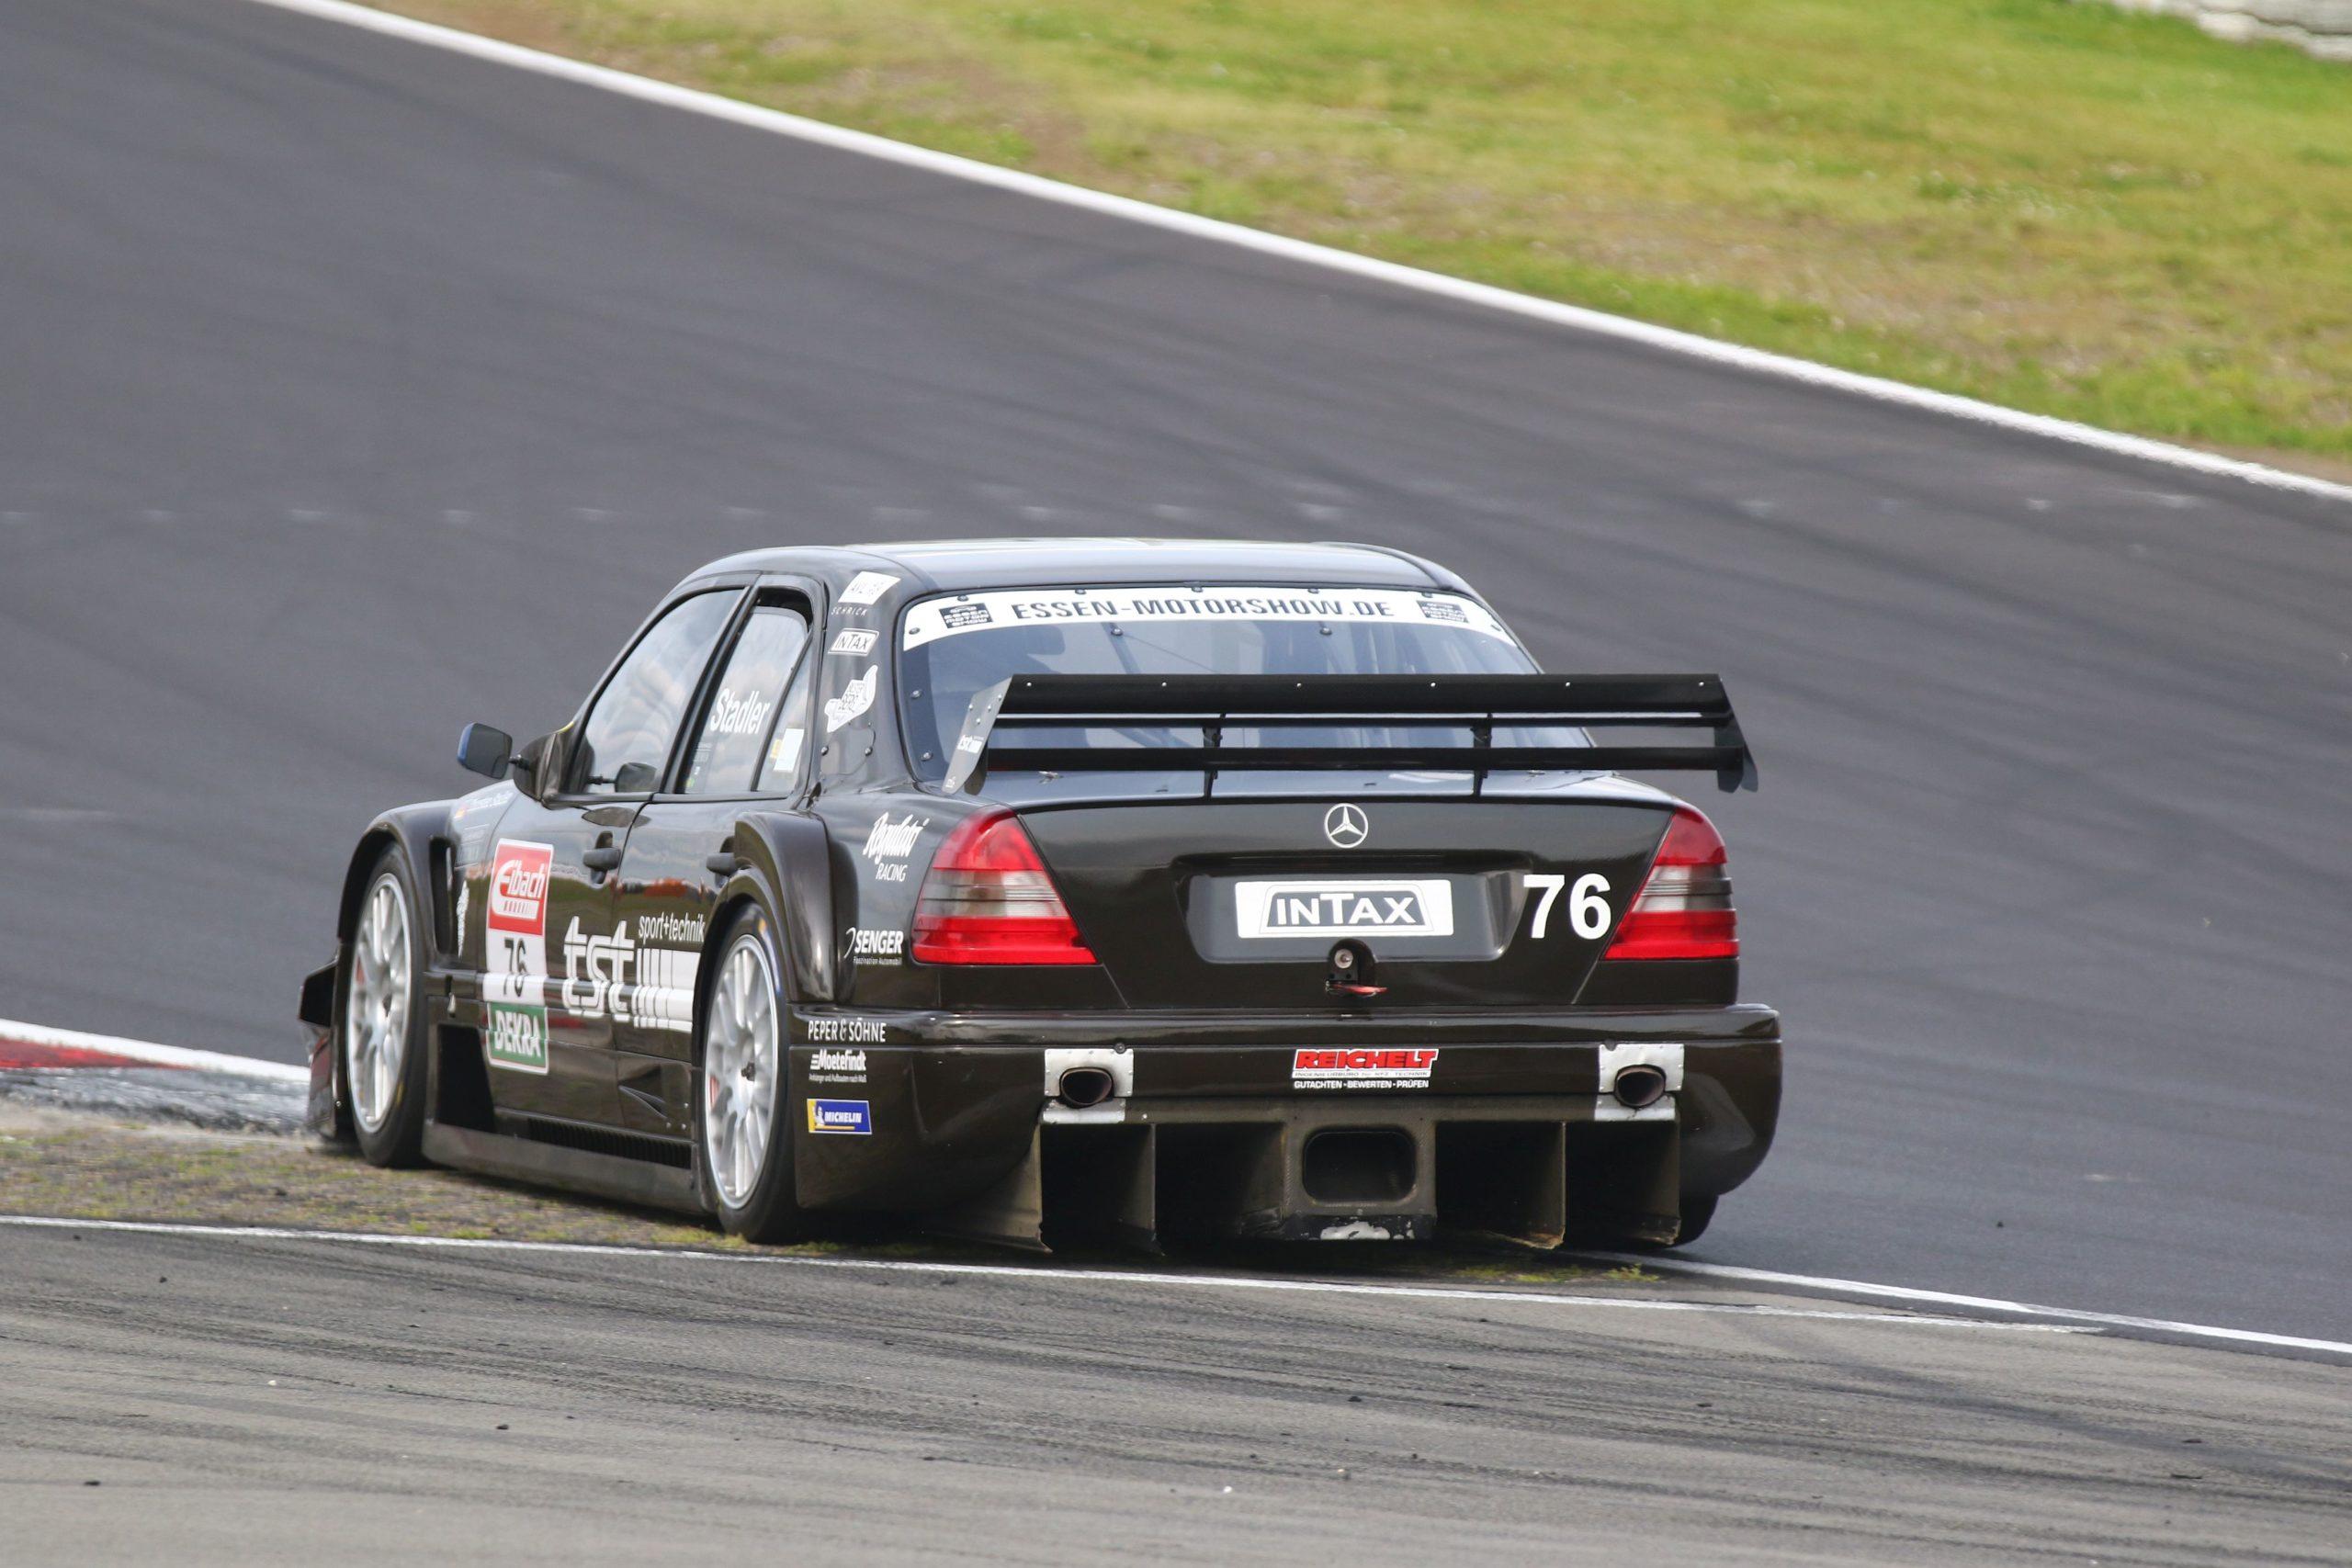 2021-DTM-Classic-Nuerburgring-tst-sport-und-technik-Mercedes-Benz-C-Klasse-Thorsten-Stadler-2116894